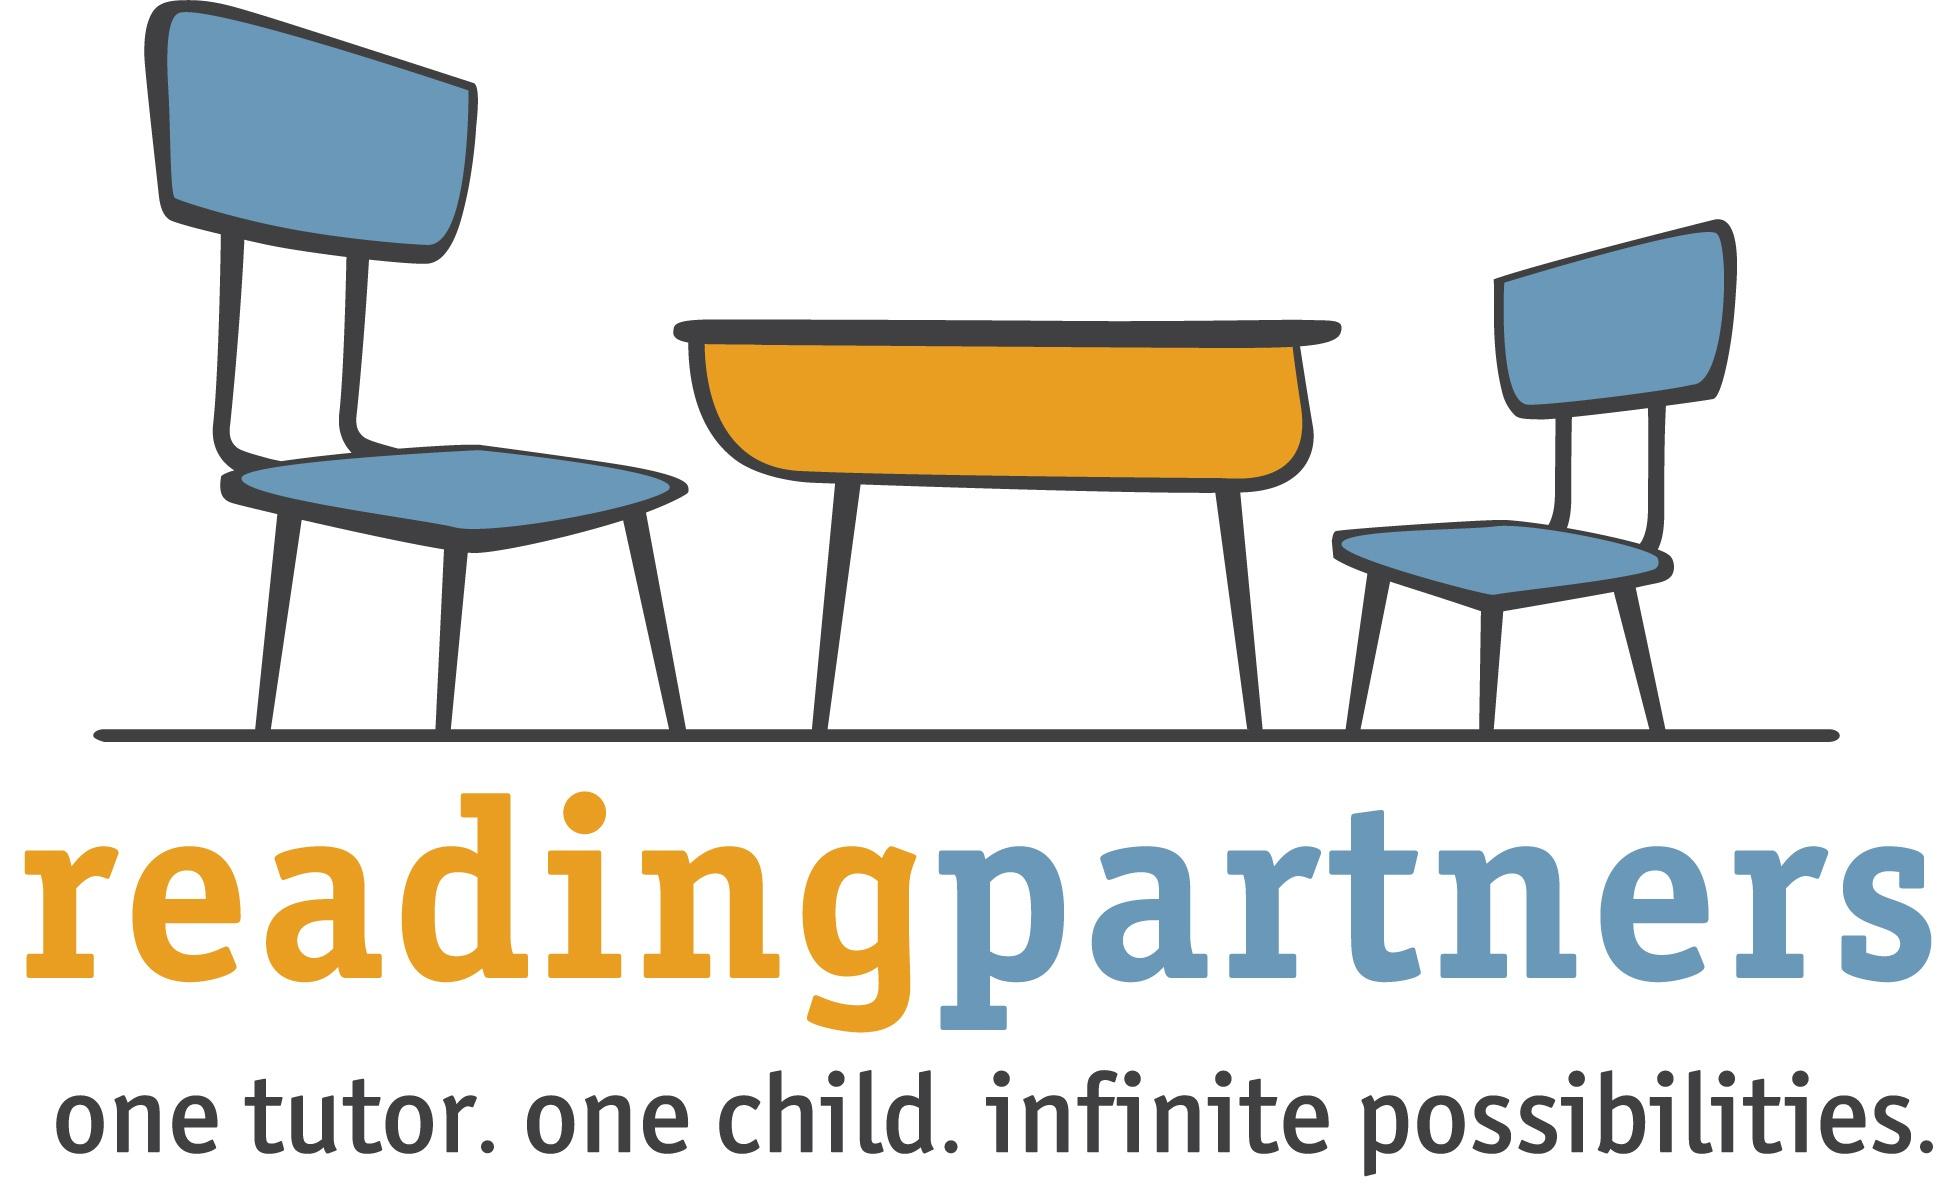 Reading-Partners-1.jpg